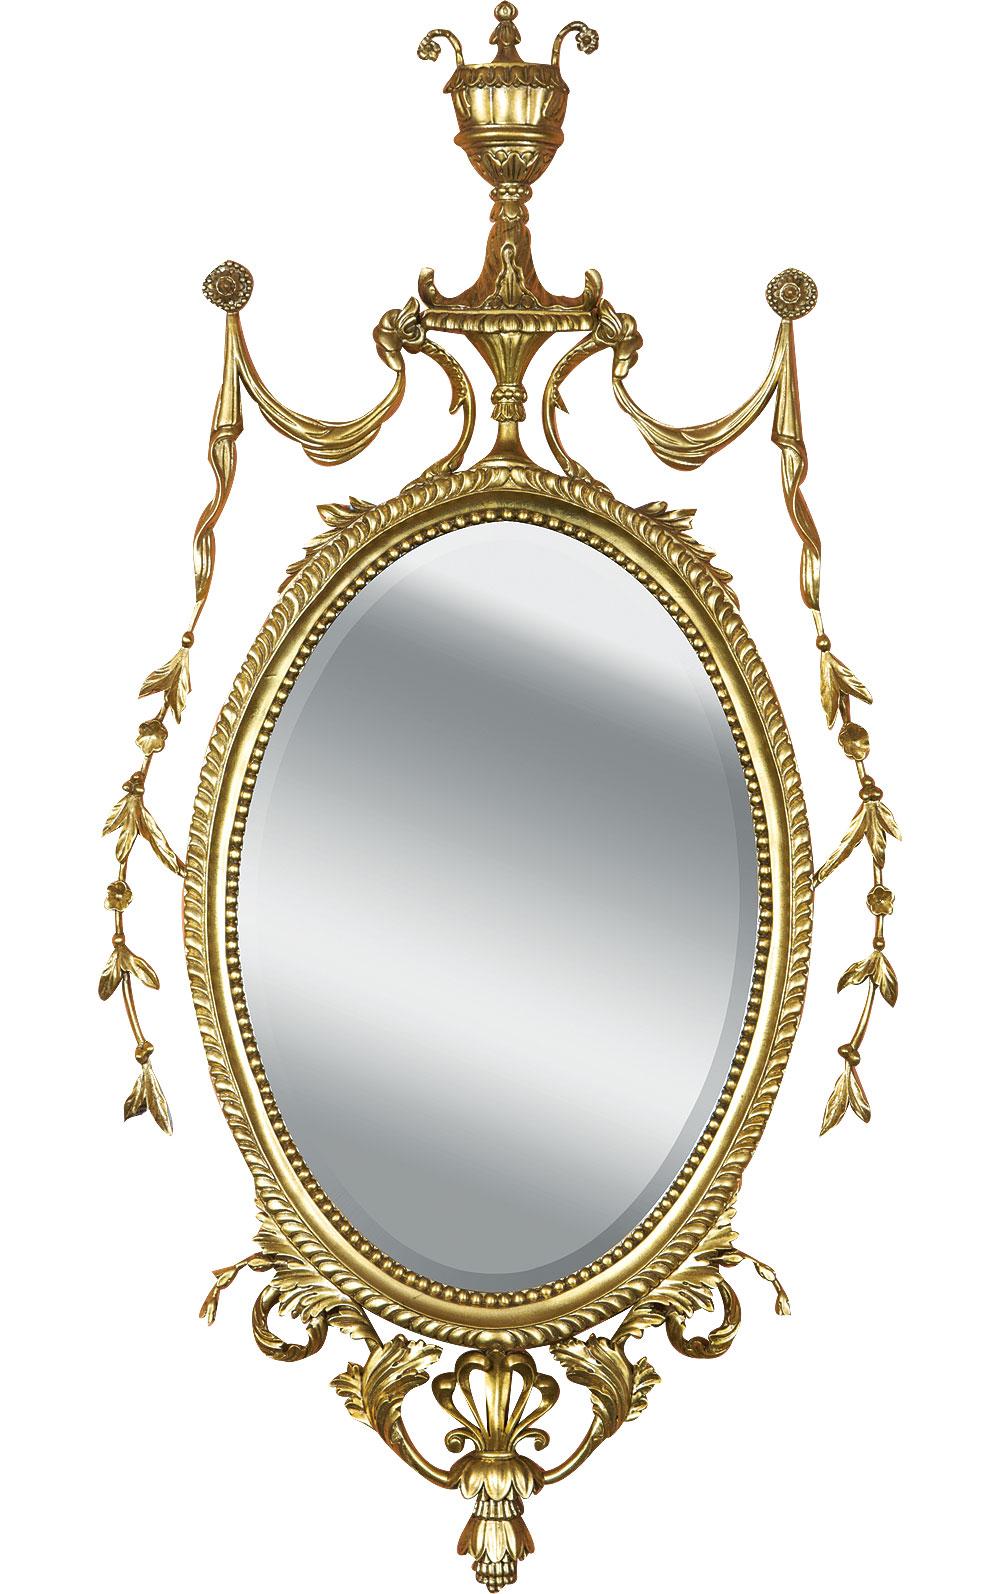 George III style mirror